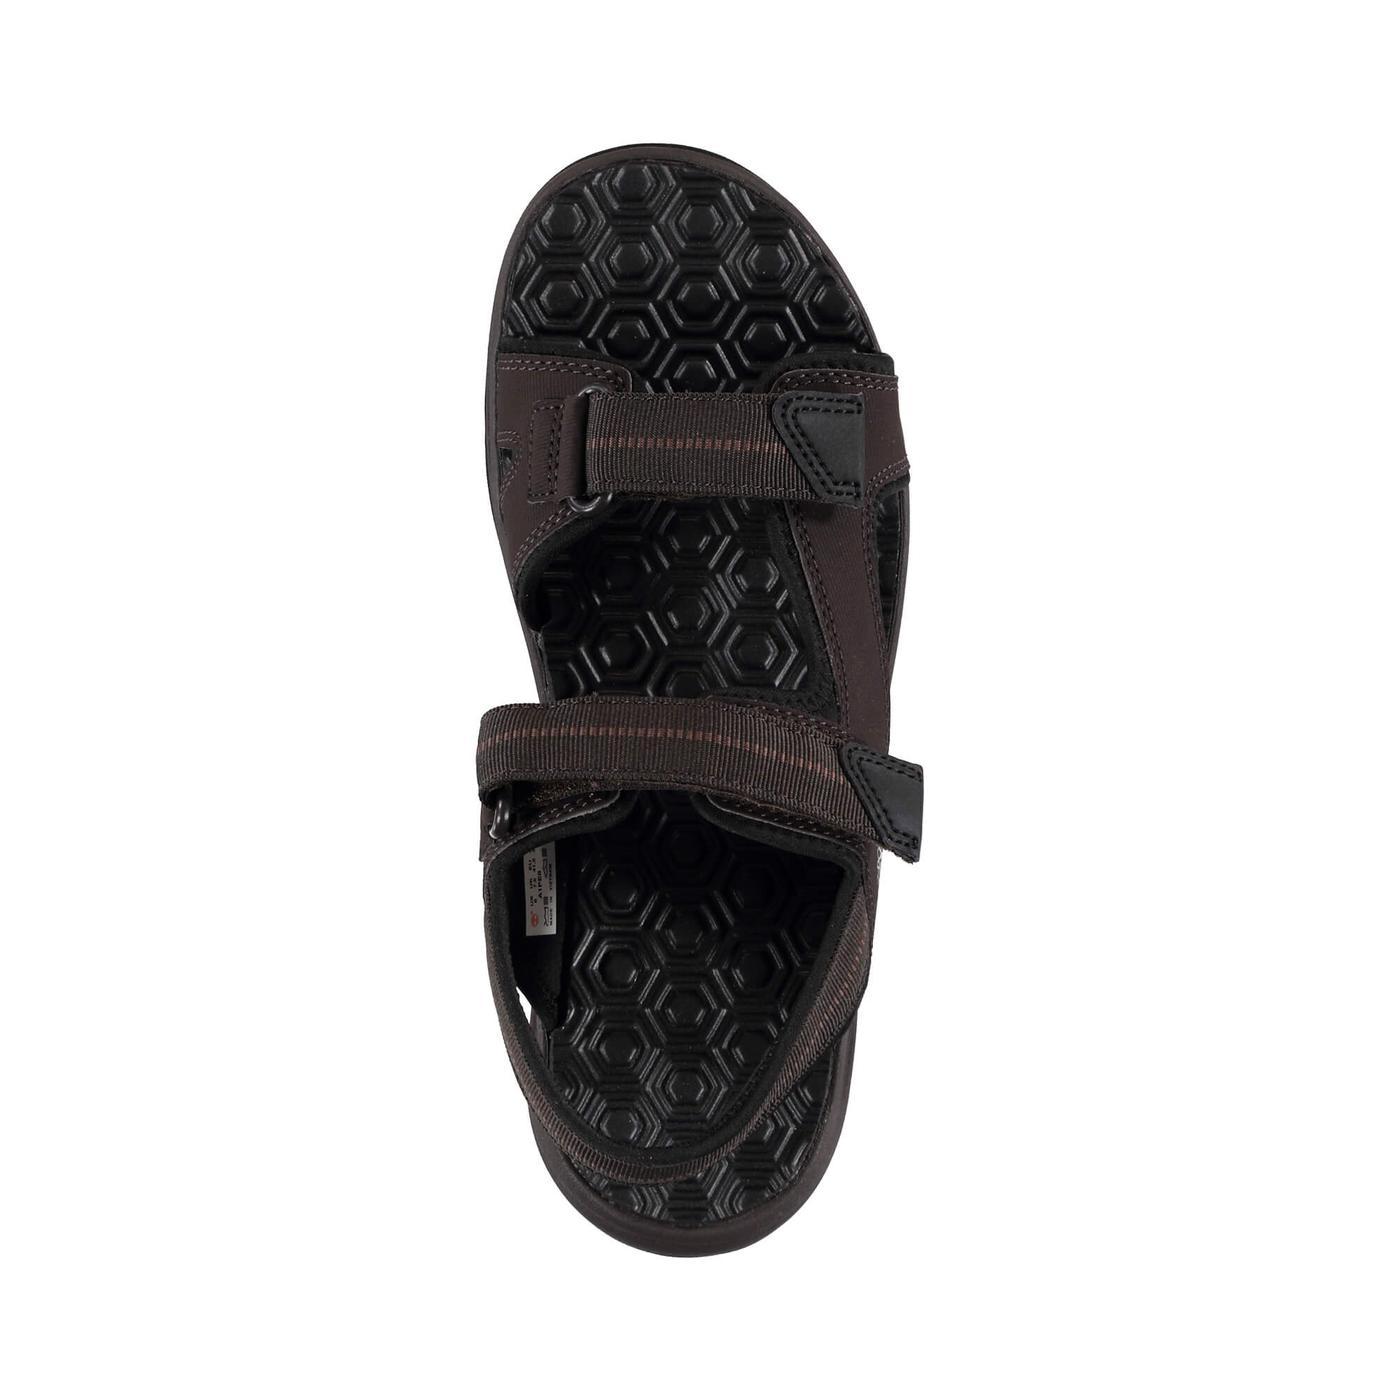 Timberland Harbor Pines Sport Sandal Erkek Kahverengi Sneakers